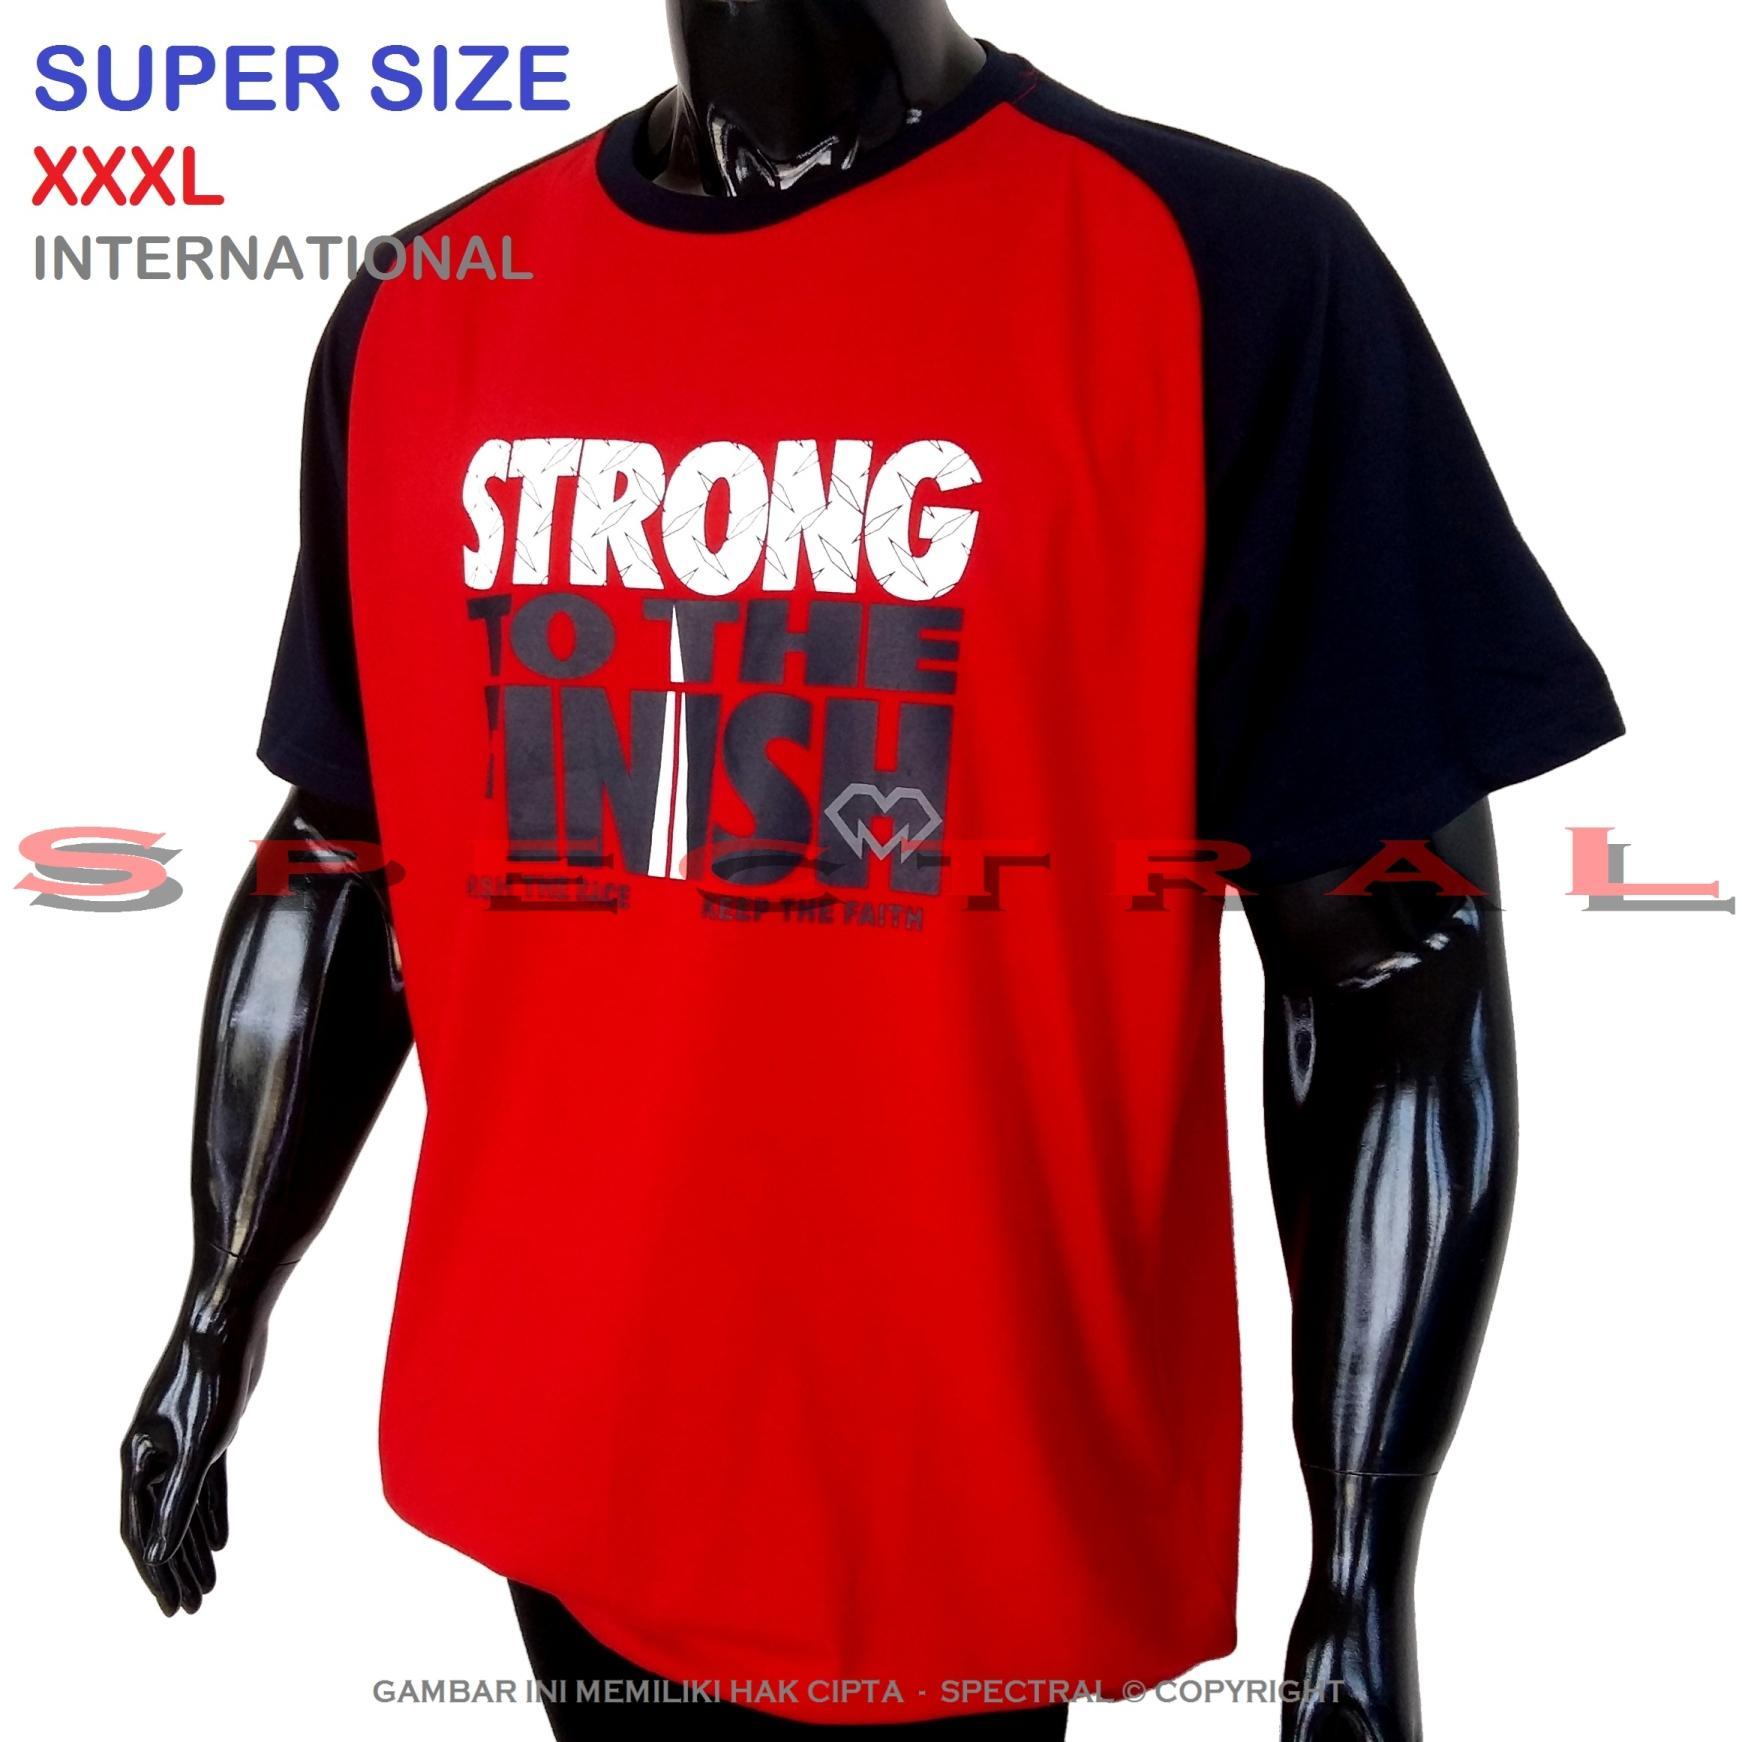 Spectral – 3XL SUPER BIG SIZE XXXL 100% Cotton Combed Kaos Distro Jumbo T-Shirt Fashion Ukuran Besar Polos Celana Olahraga Atasan Pria Wanita Dewasa Bapak Orang Tua Muda Terbaru Gemuk Gendut Sport Casual Bagus Keren Baju Cowo Cewe Pakaian 3L Raglan Reglan